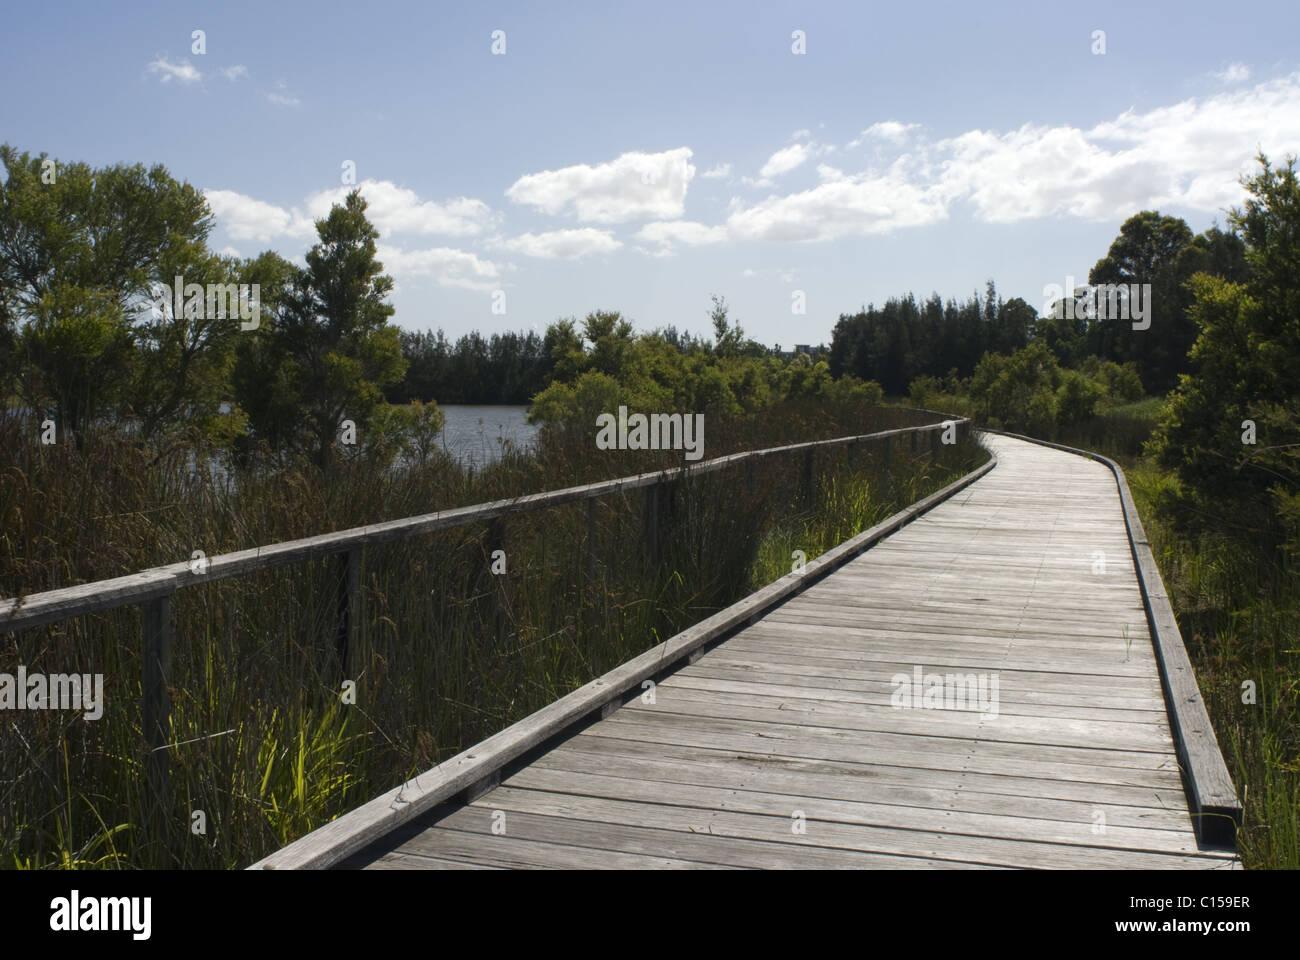 The boardwalk through the mangroves, Bicentennial Park, Homebush, Sydney, NSW, Australia - Stock Image